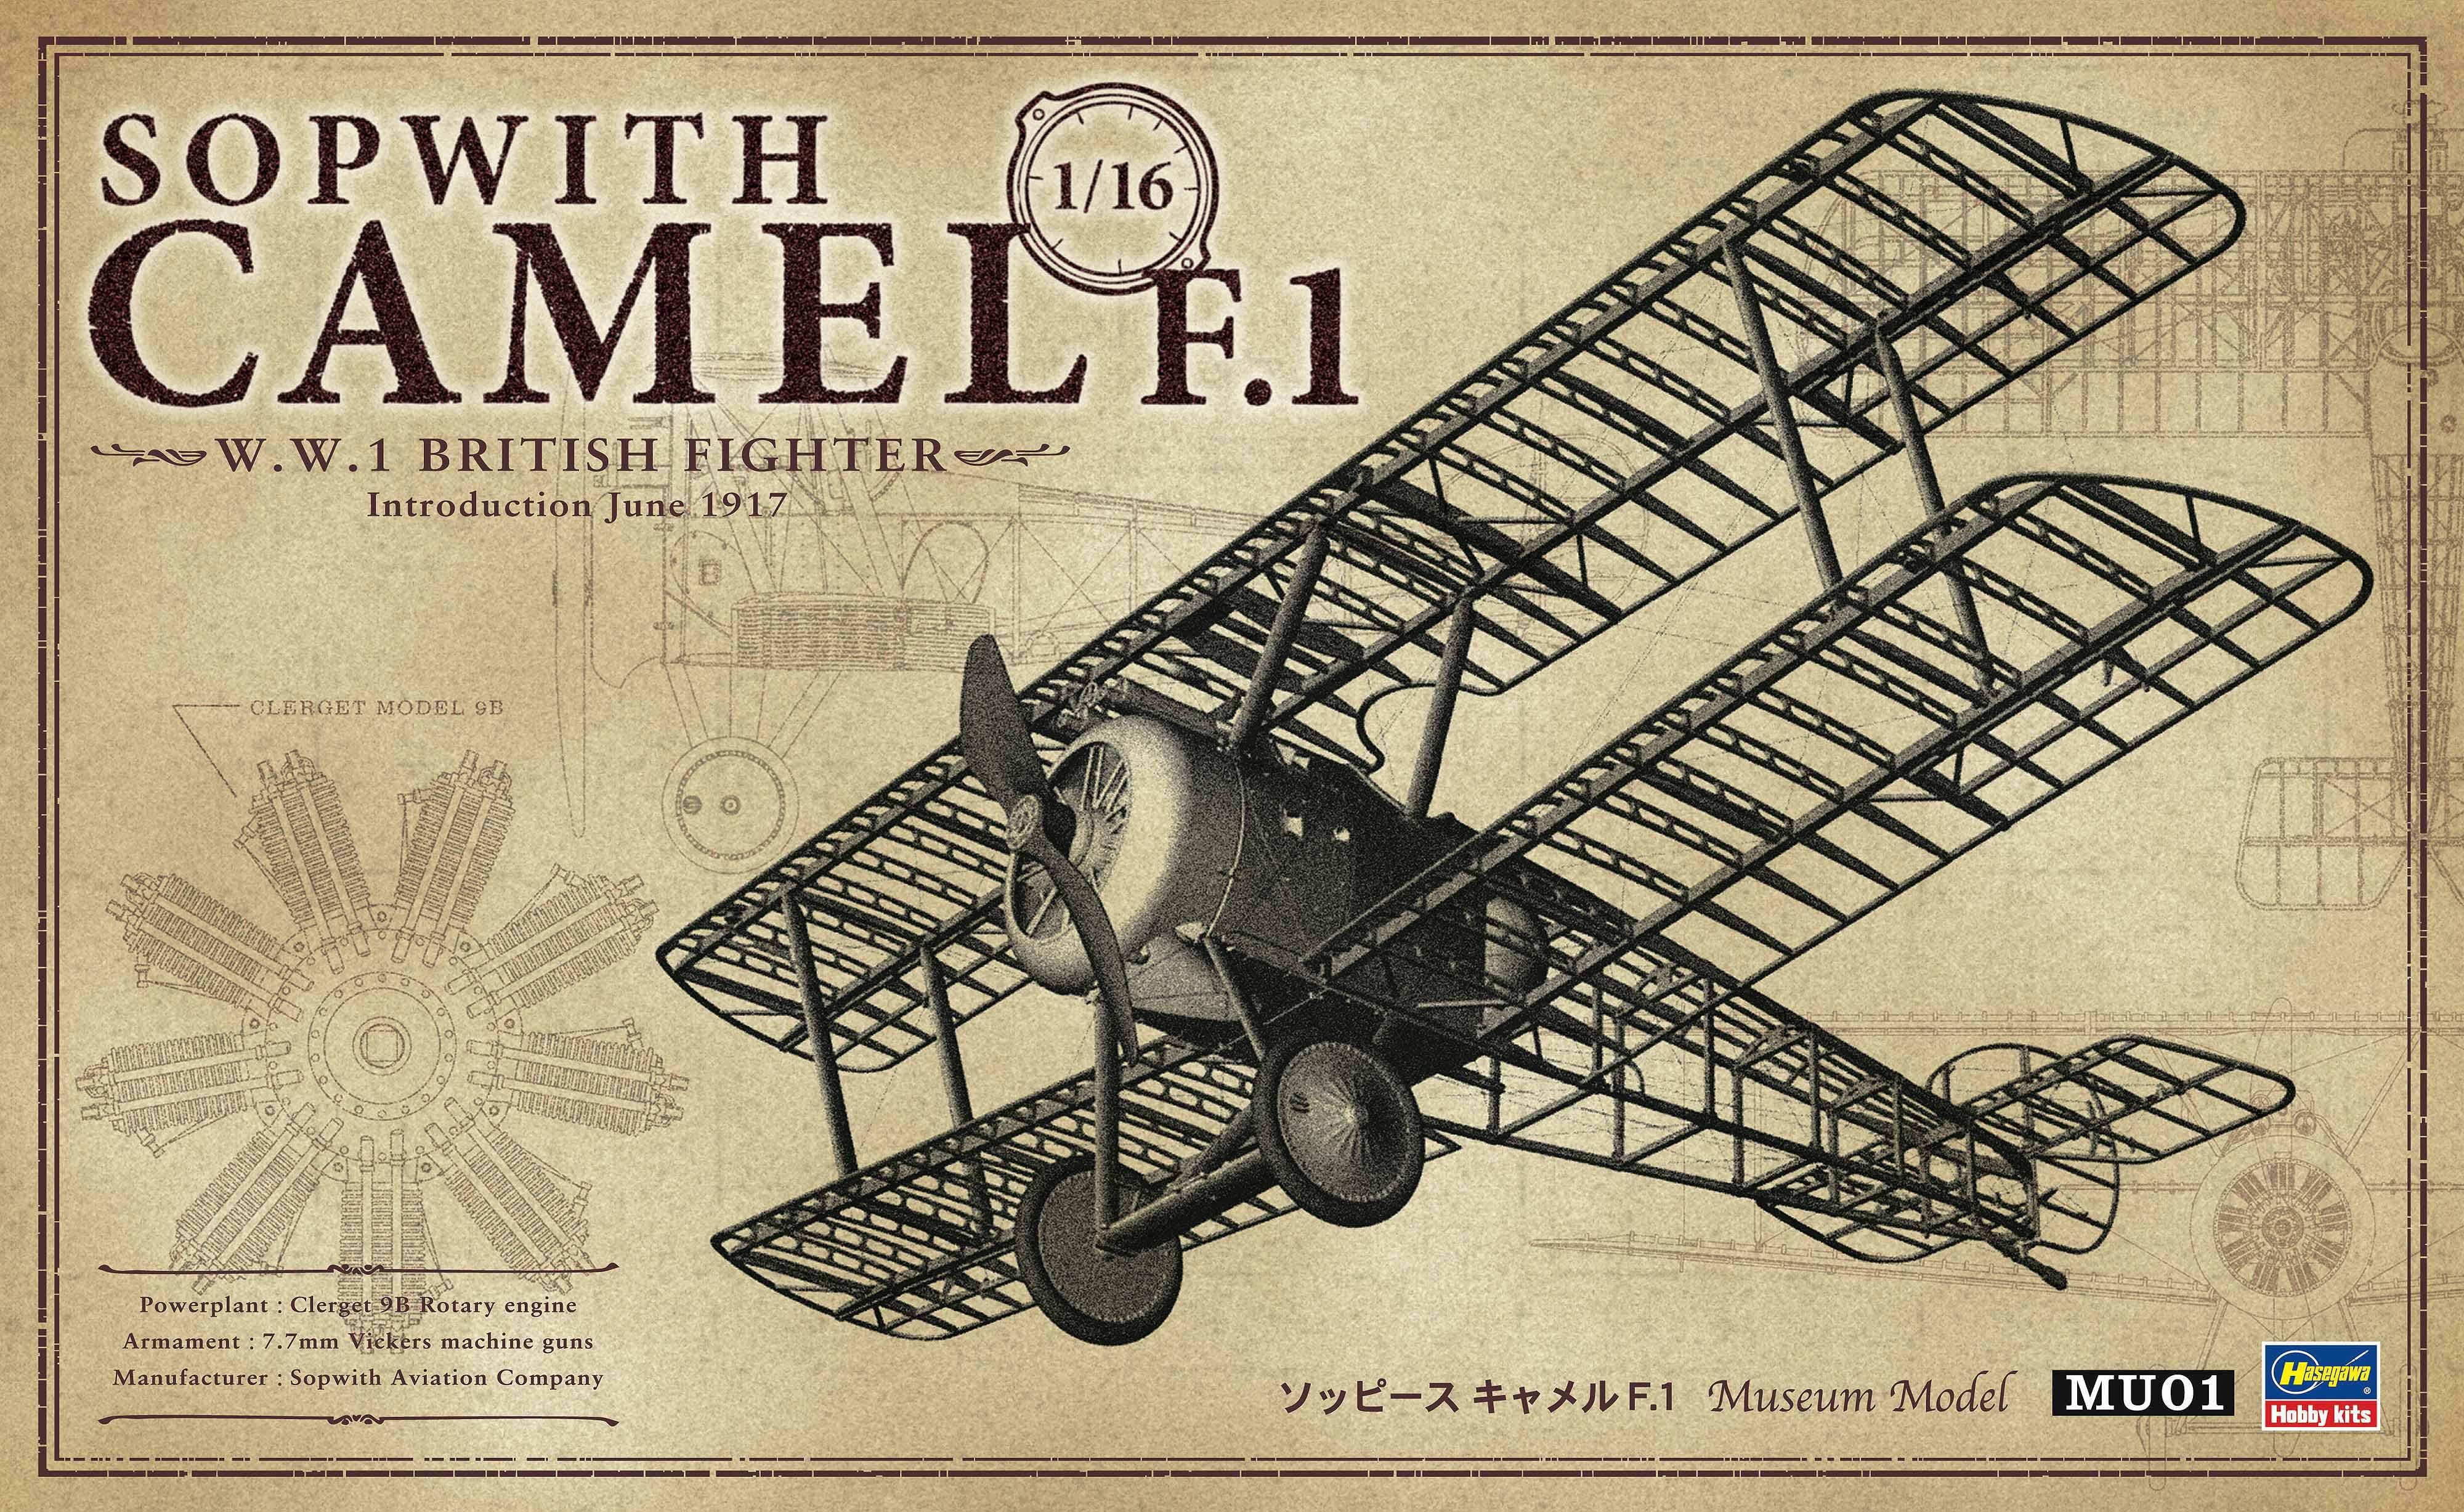 Hasegawa 1/16 Sopwith Camel F.1